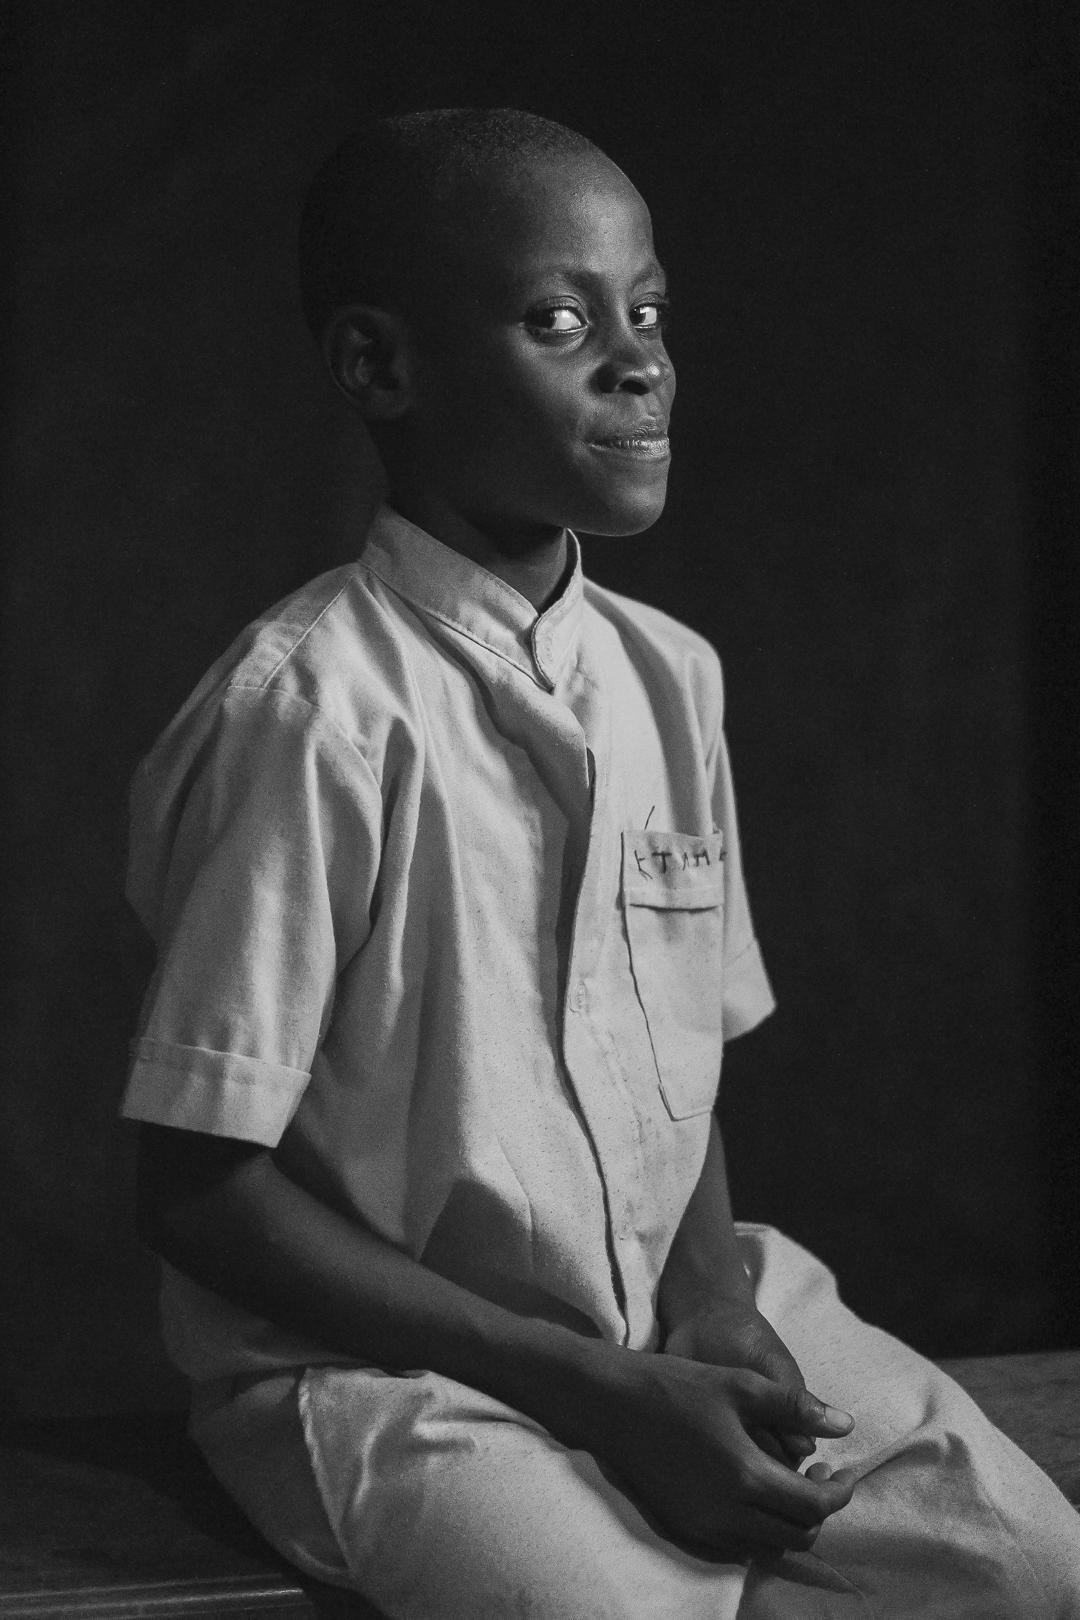 Moukouri | 10 years old